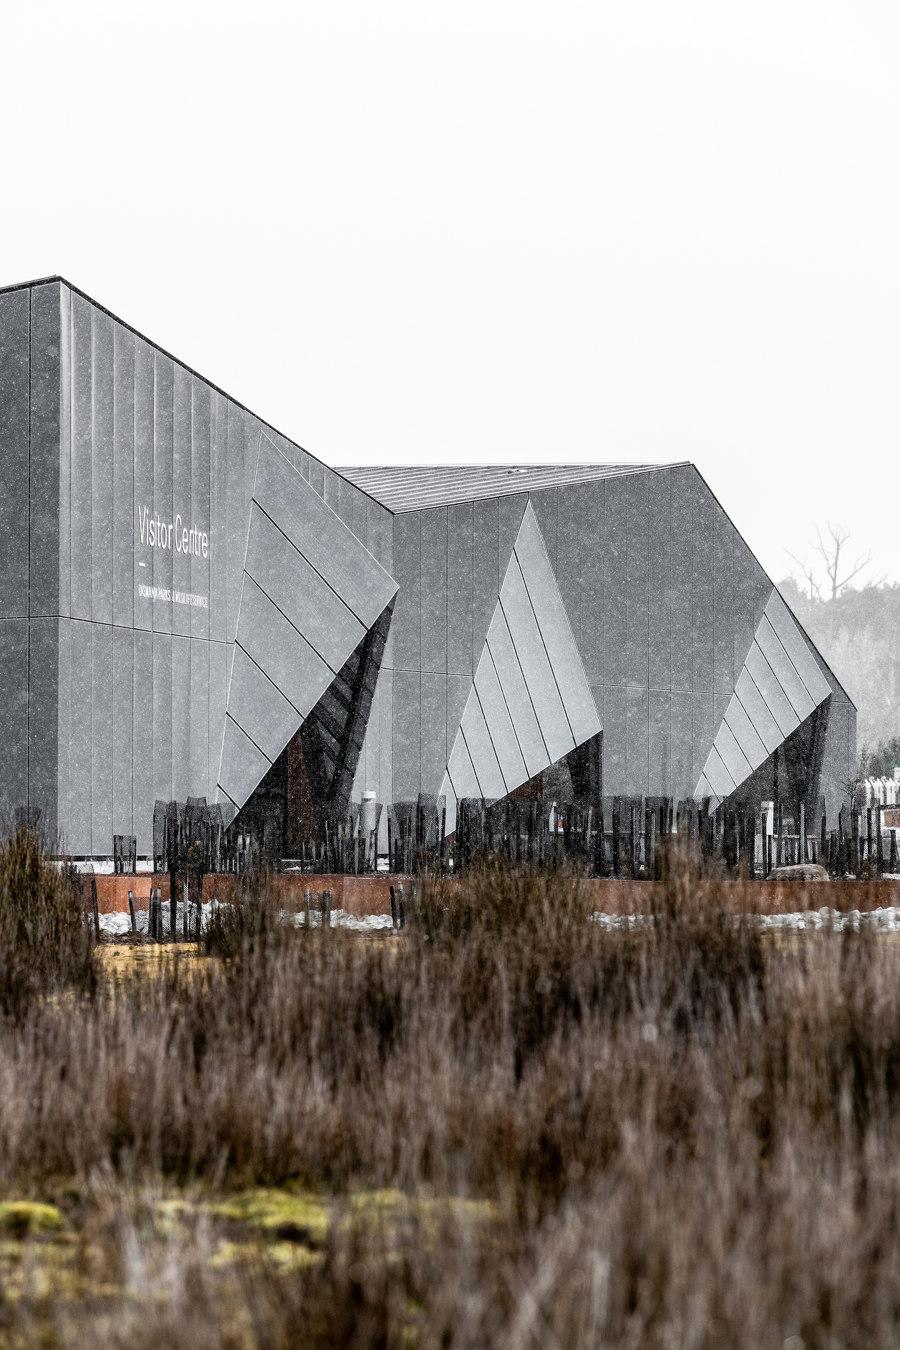 Cradle Mountain Visitor Centre by Cumulus Studio   Trade fair & exhibition buildings